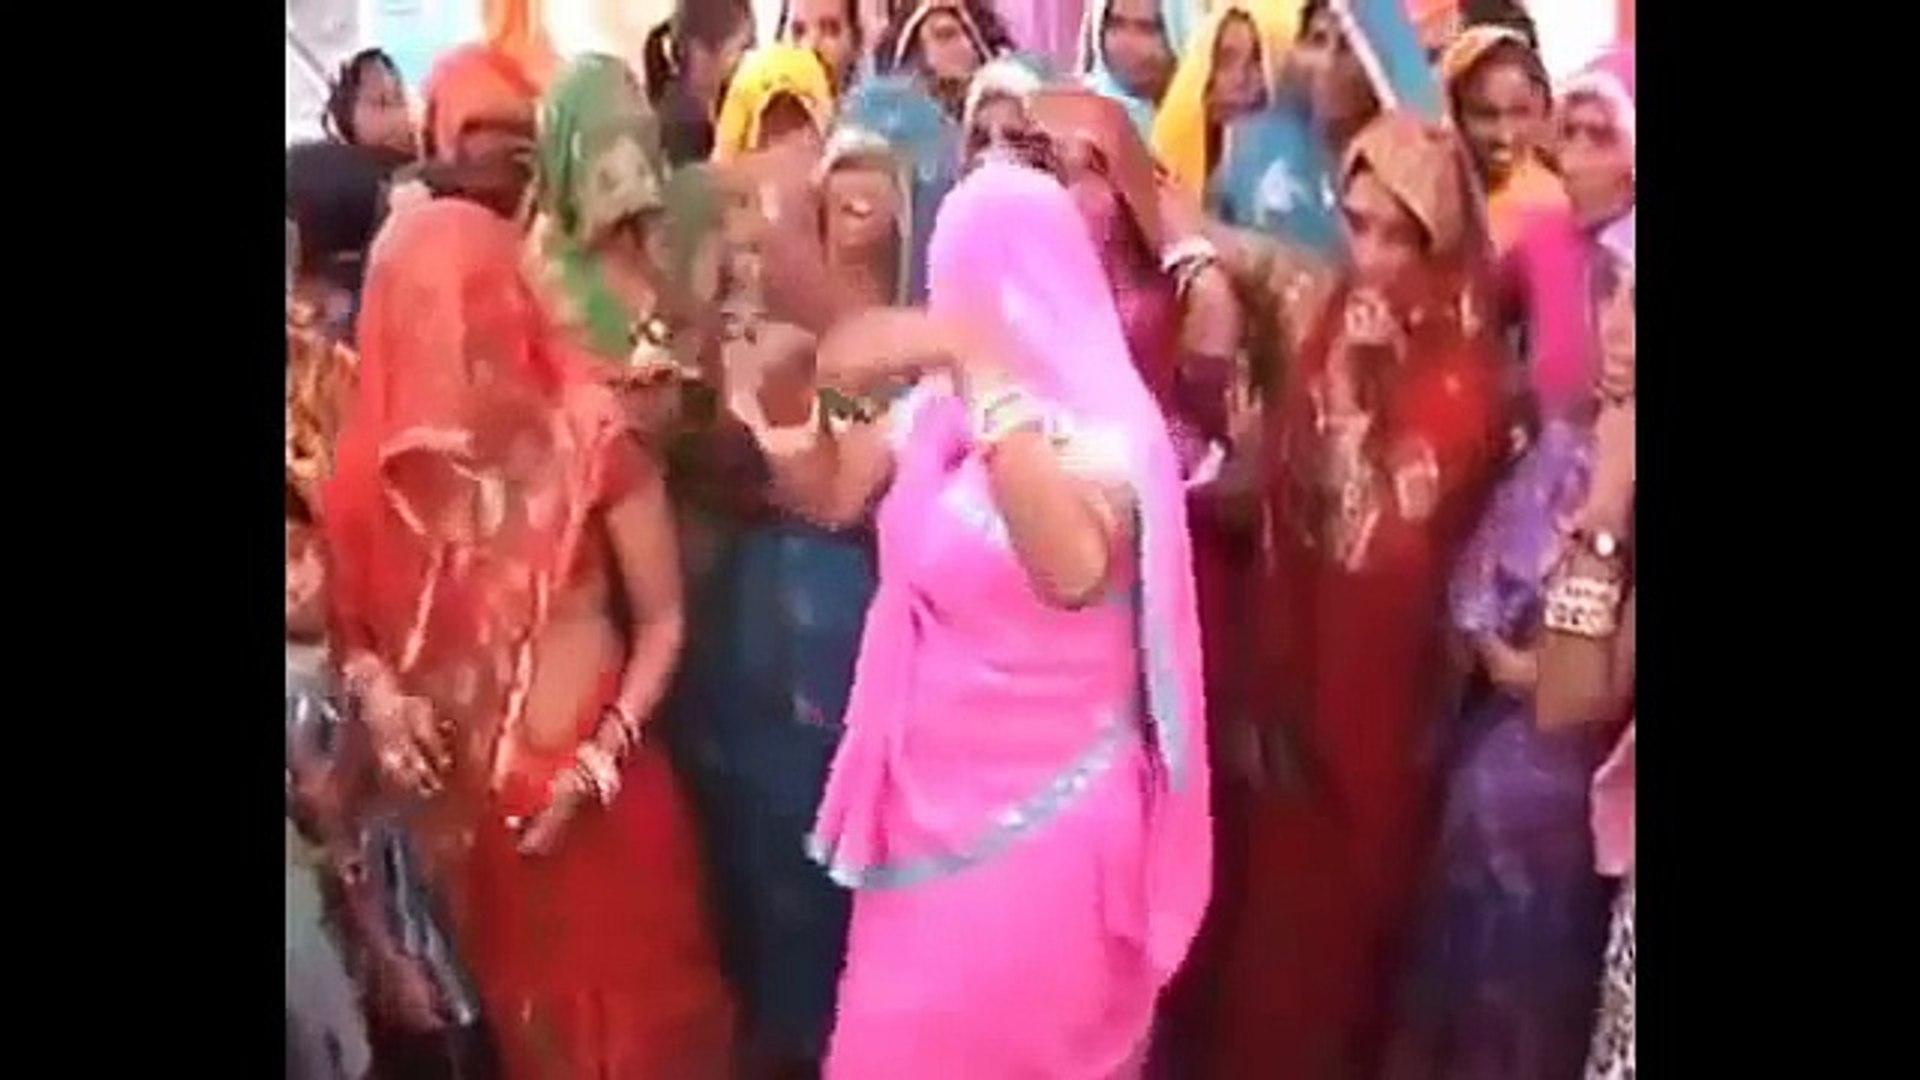 Indian Funny Videos Compilation 2015 Videos Engra ados Para Whatsapp Funny wedding videos